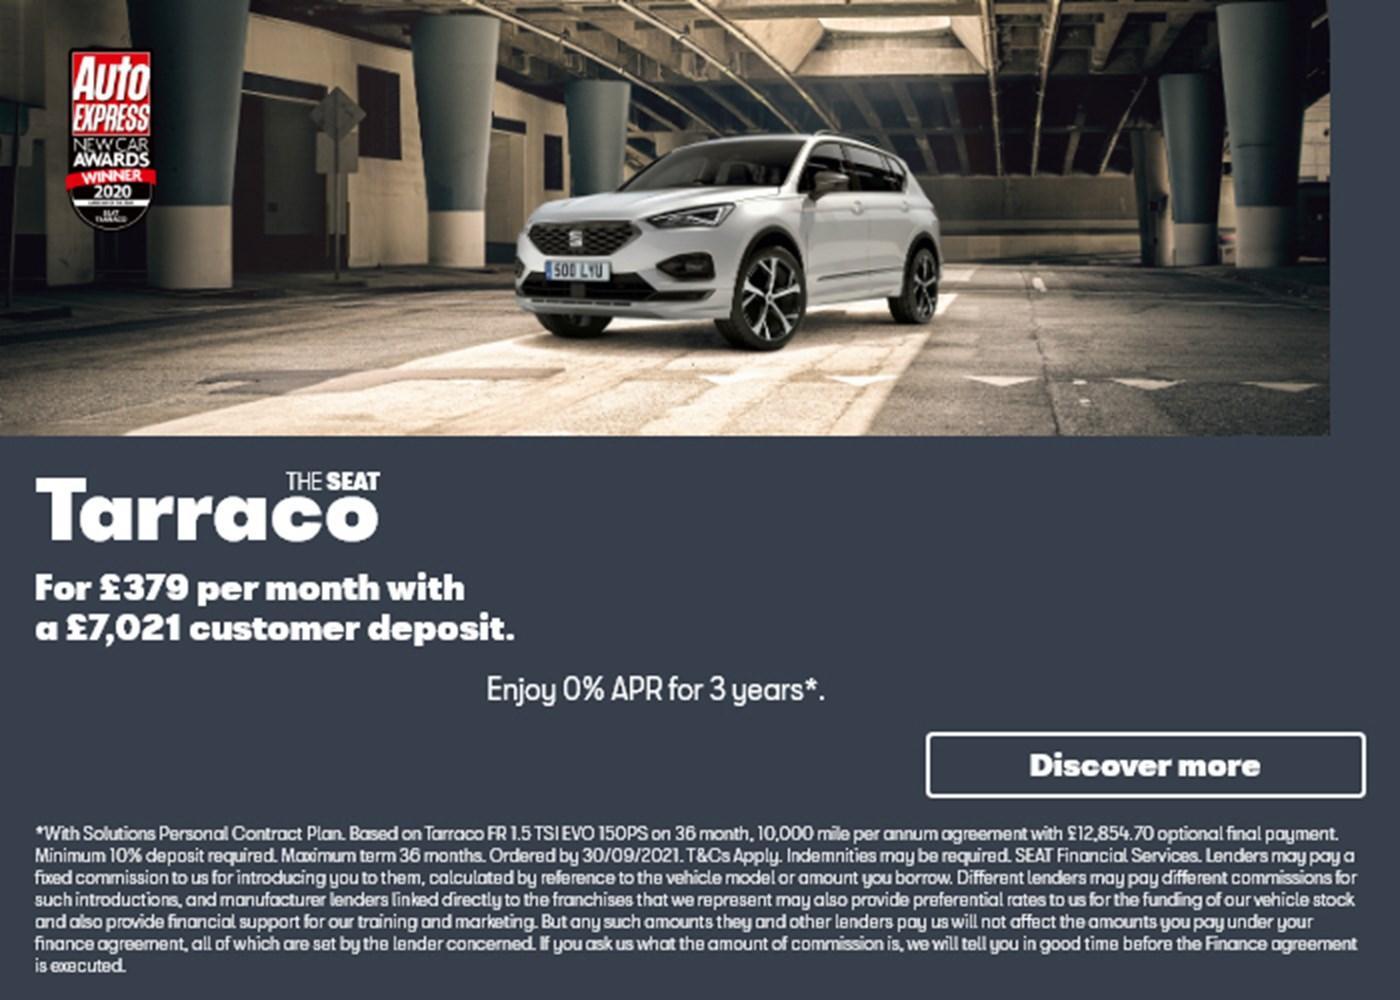 New SEAT Tarraco offer at Chippenham Motor Company